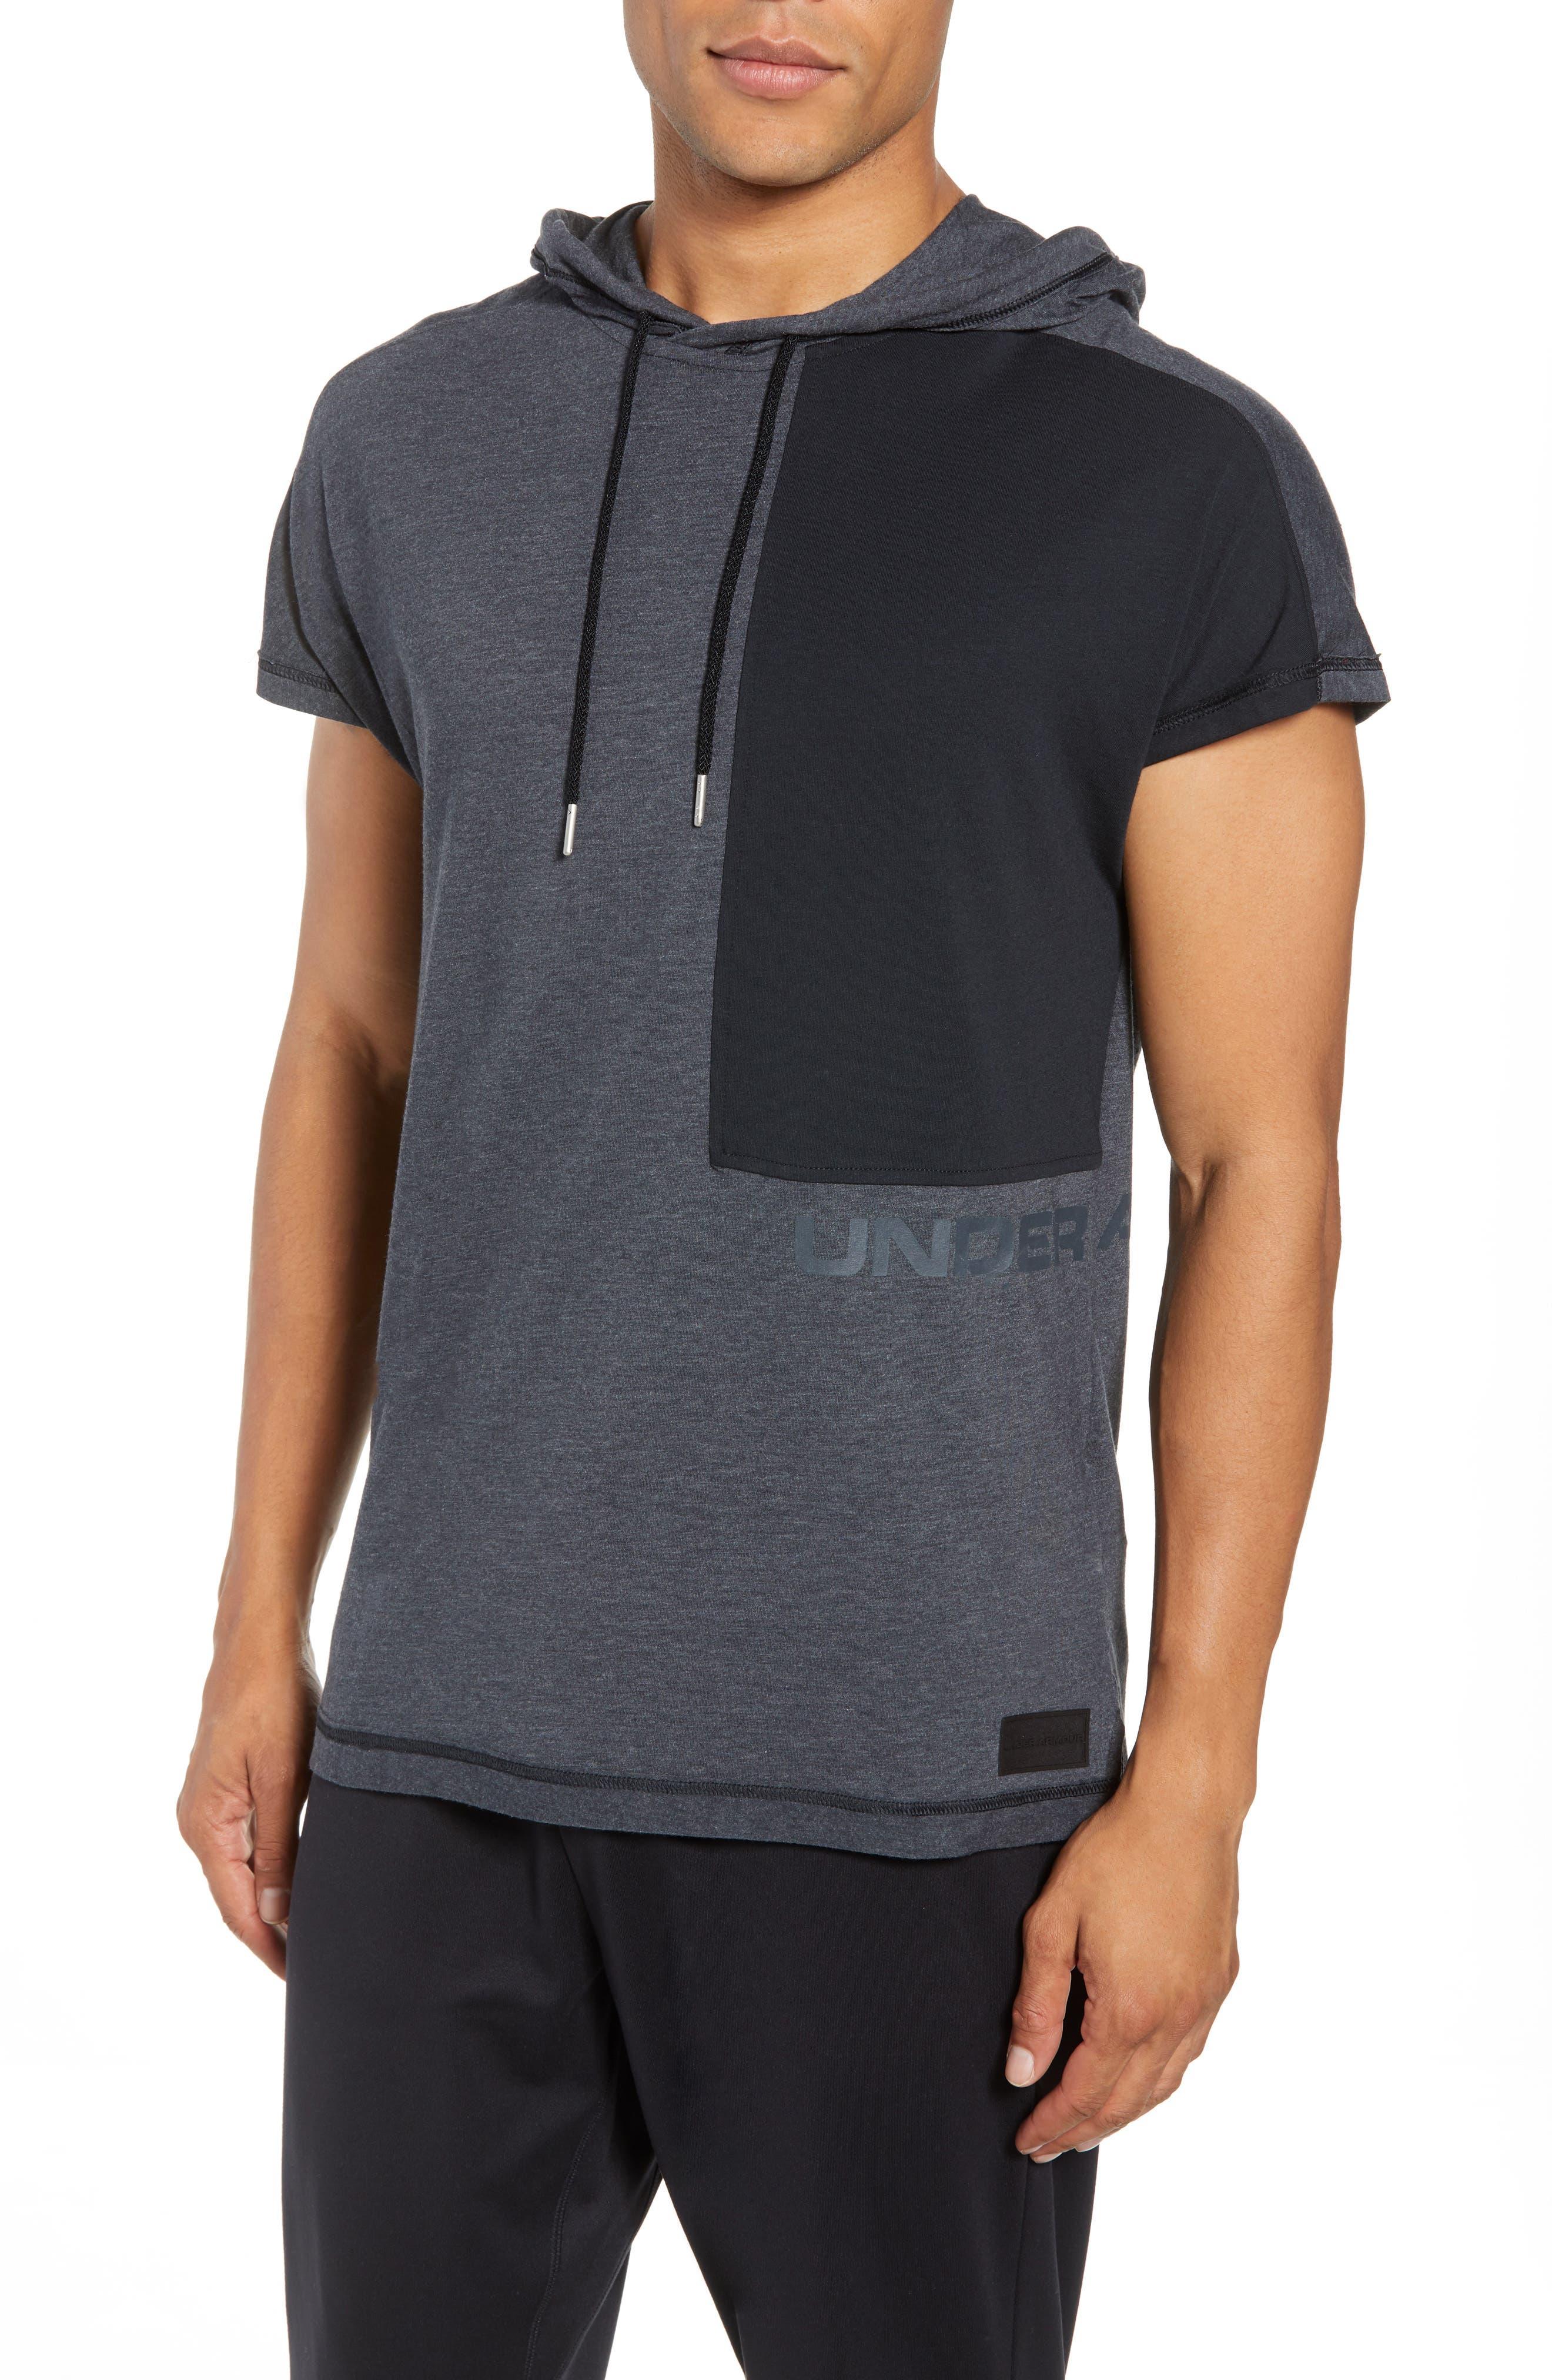 Pursuit Short Sleeve Hoodie,                         Main,                         color, Black/ Black/ Stealth Gray